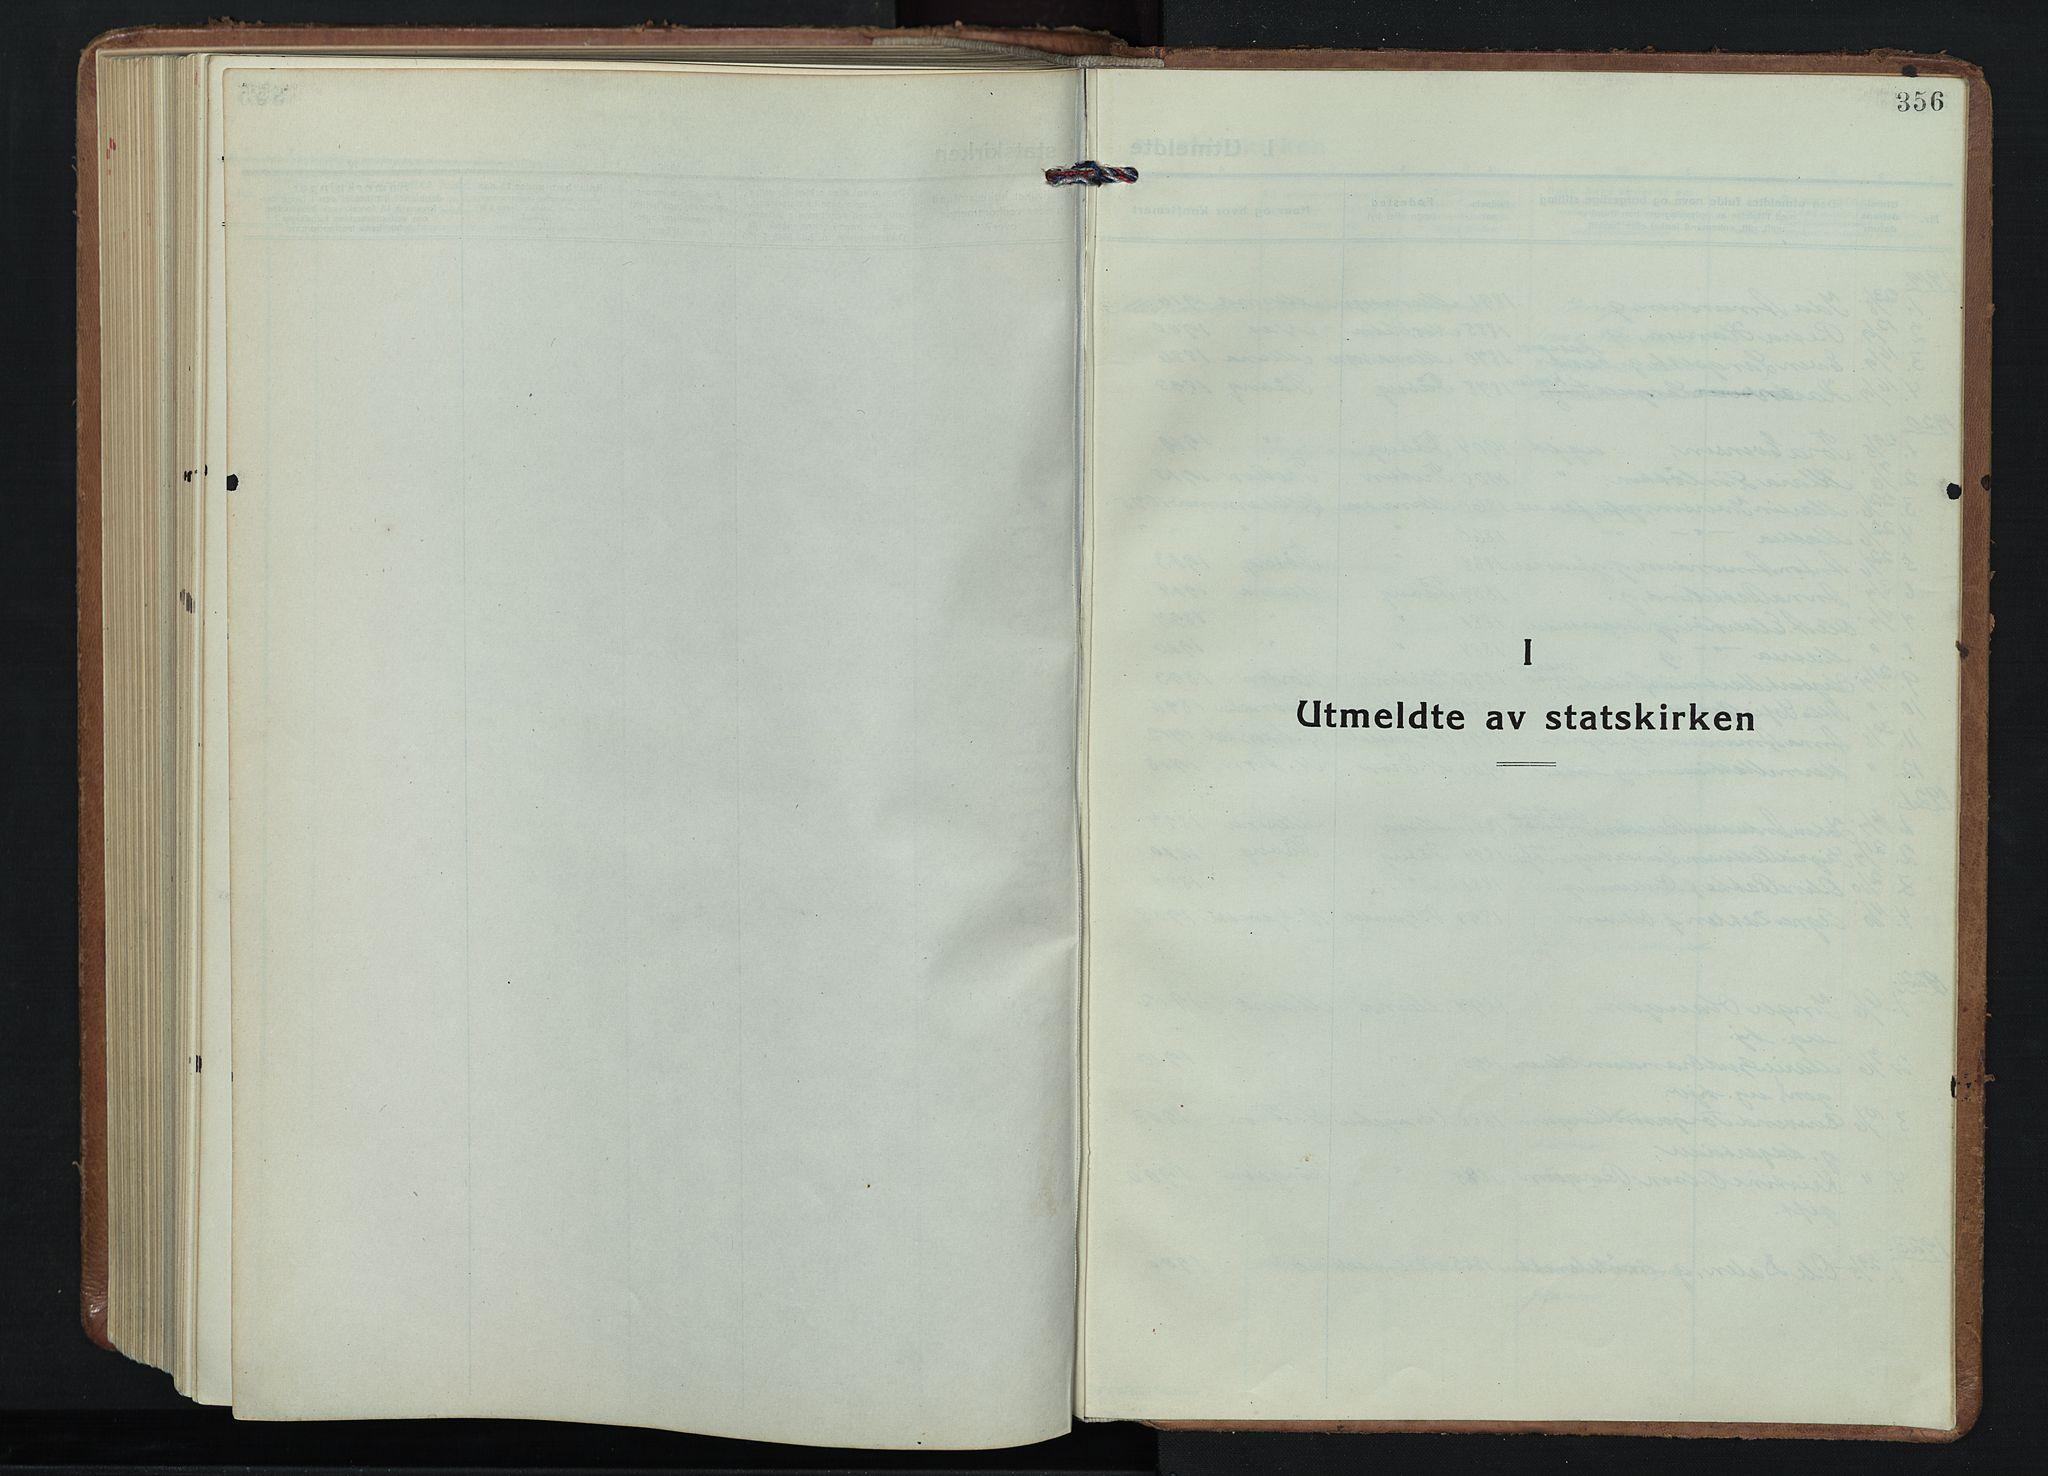 SAH, Fåberg prestekontor, Klokkerbok nr. 15, 1924-1949, s. 356